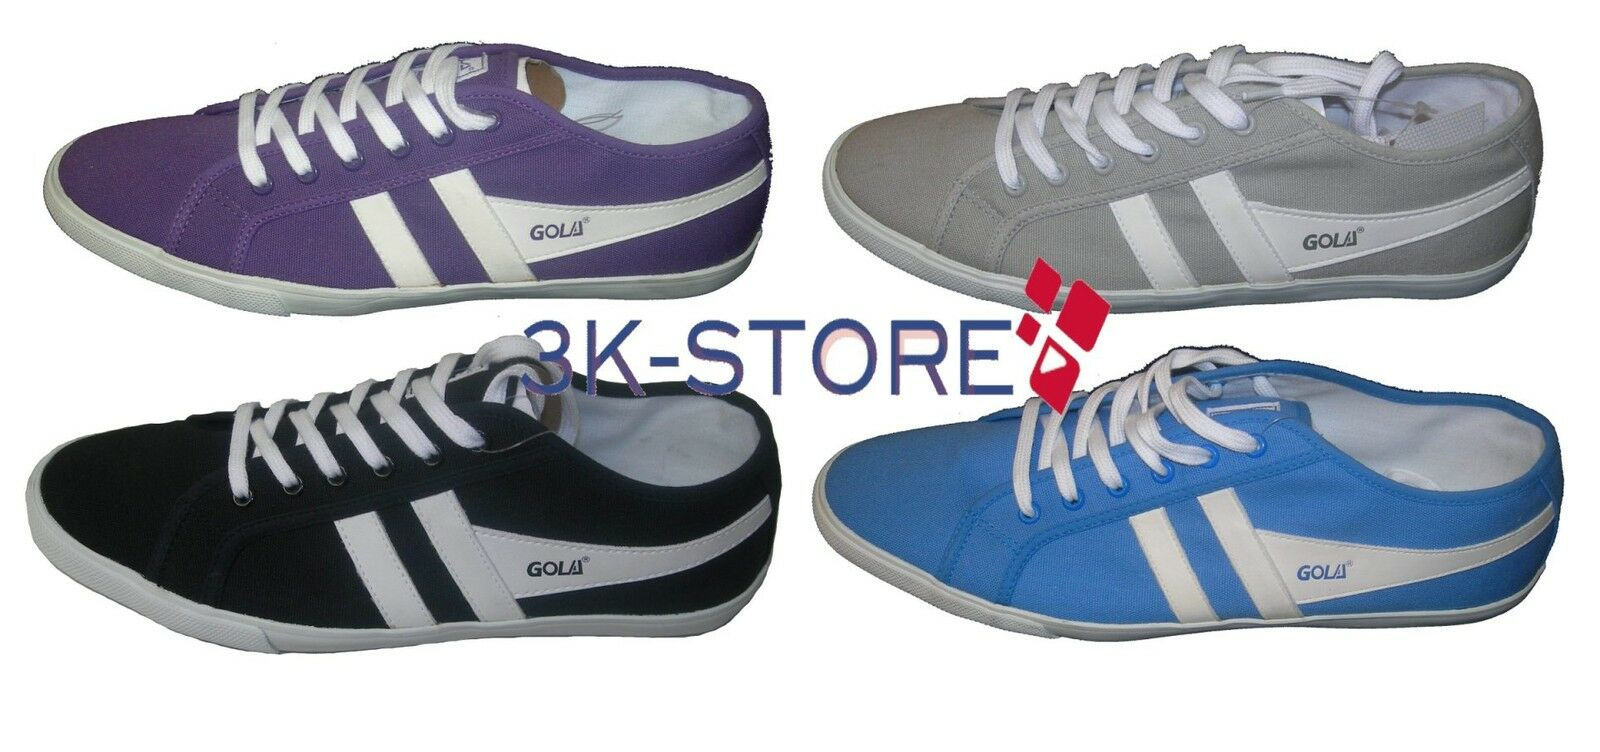 Billig hohe Qualität Scarpa Schuhe GOLA